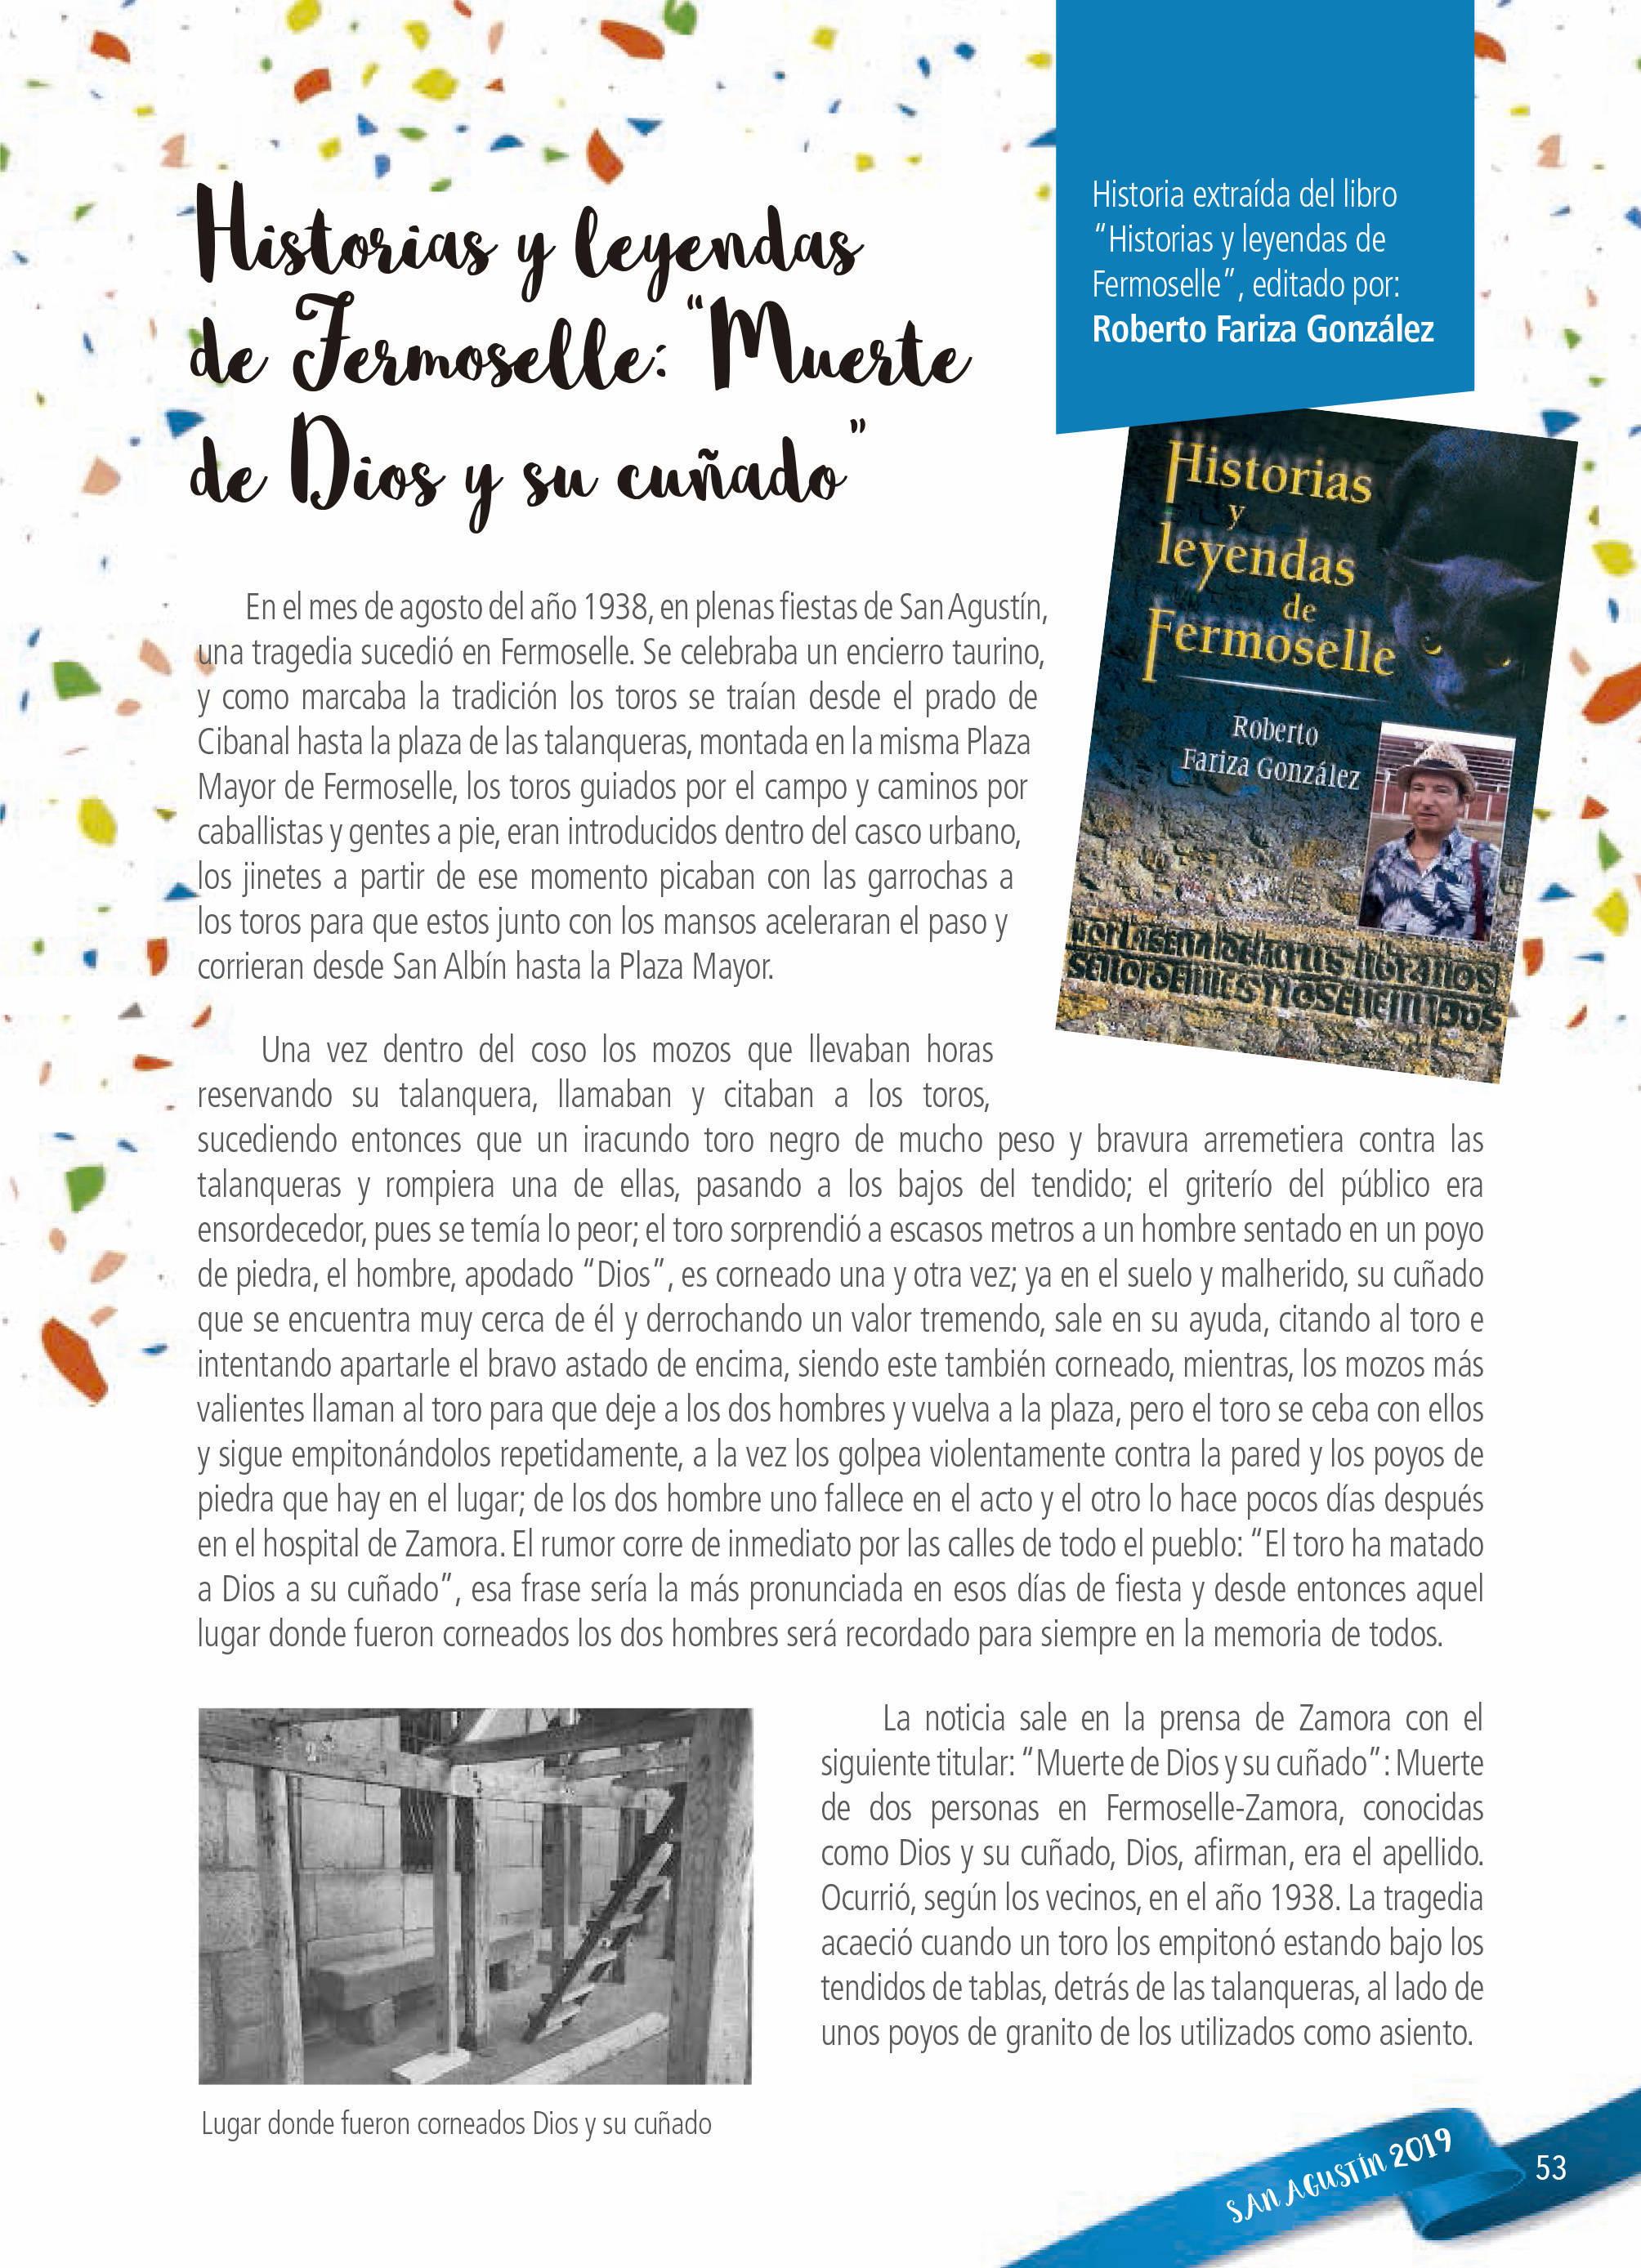 Programa de ferias y fiestas 2019 - Fermoselle (Zamora) 21